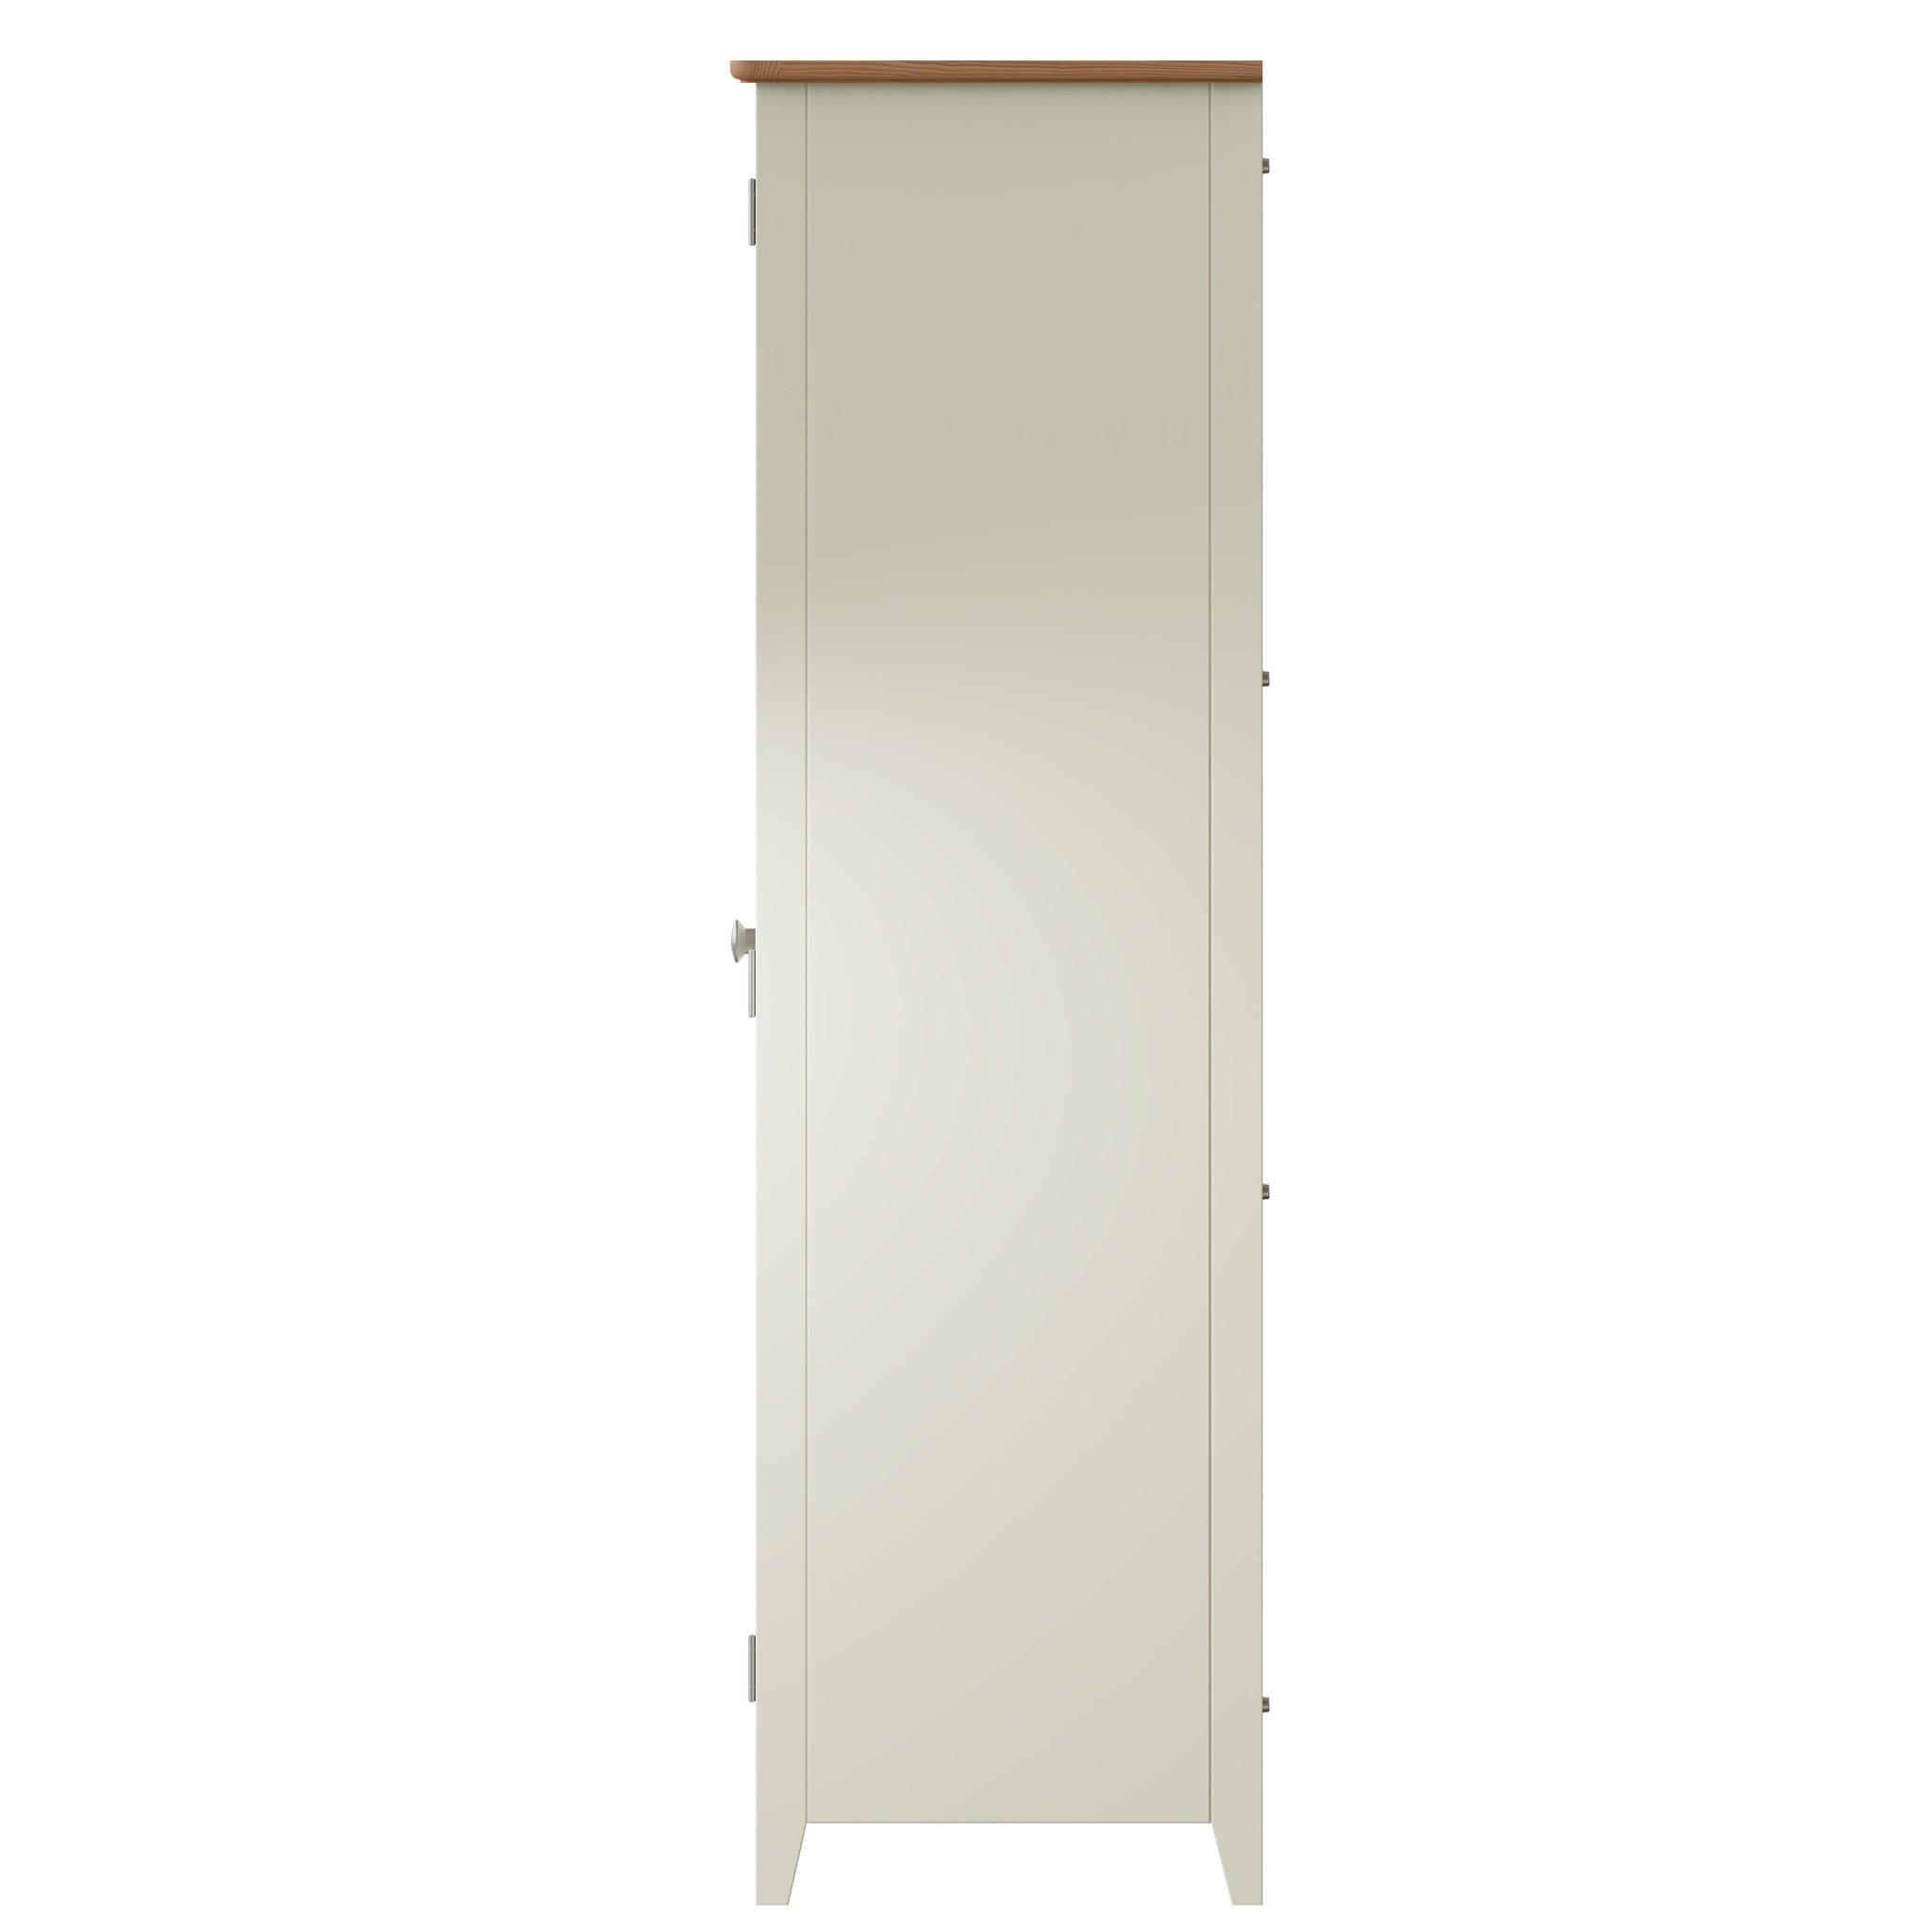 Essentials Painted Full Hanging Wardrobe - White